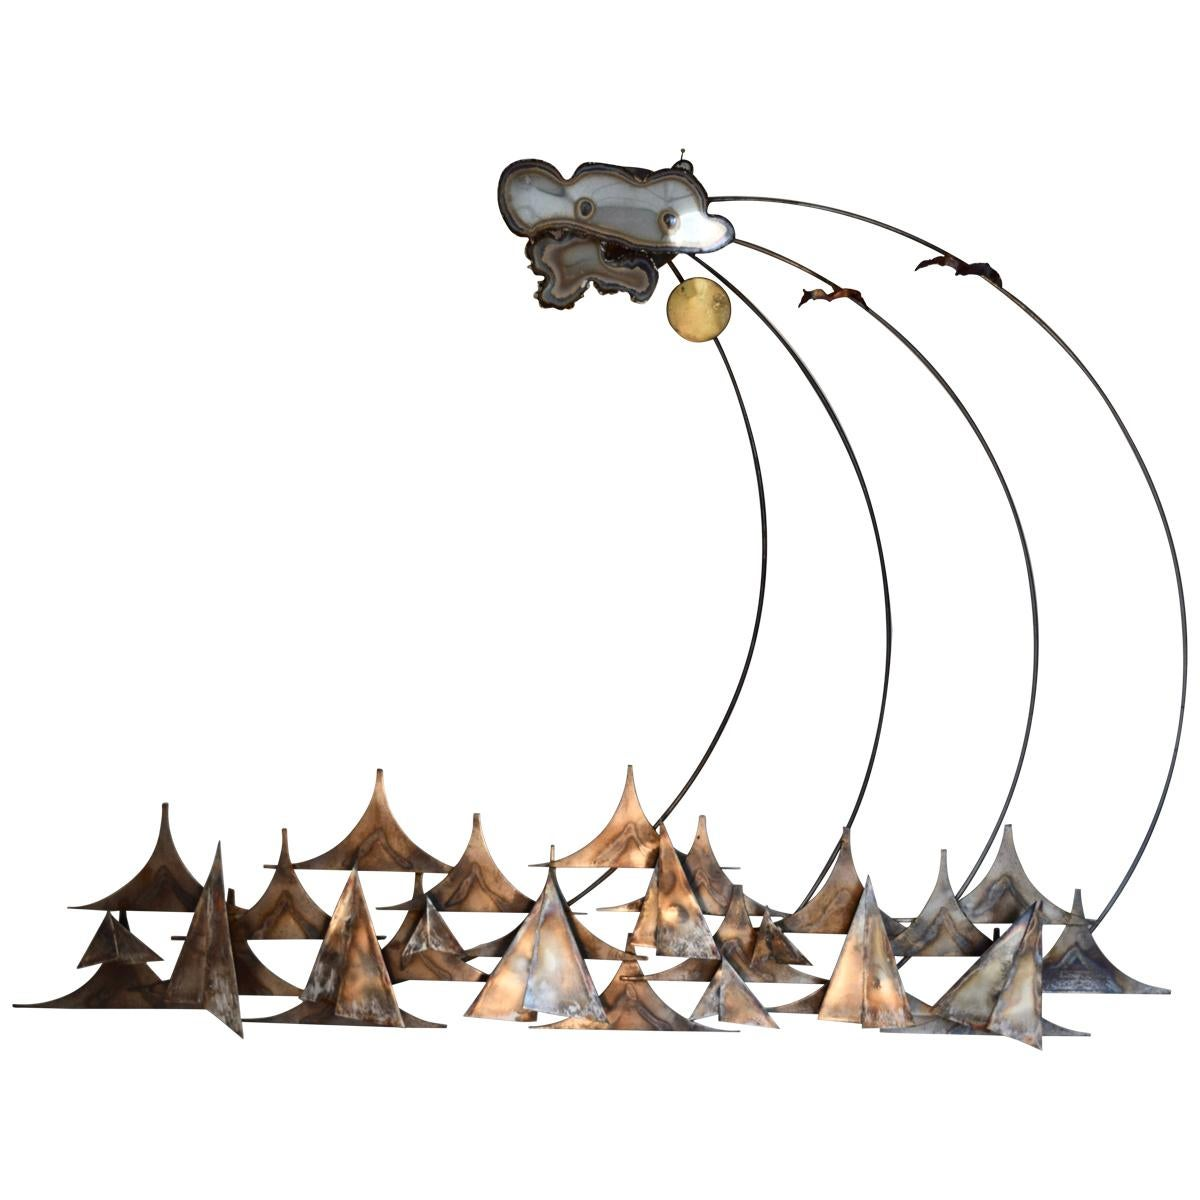 A.J. Stillman Mixed Metals Hanging Wall Sculpture